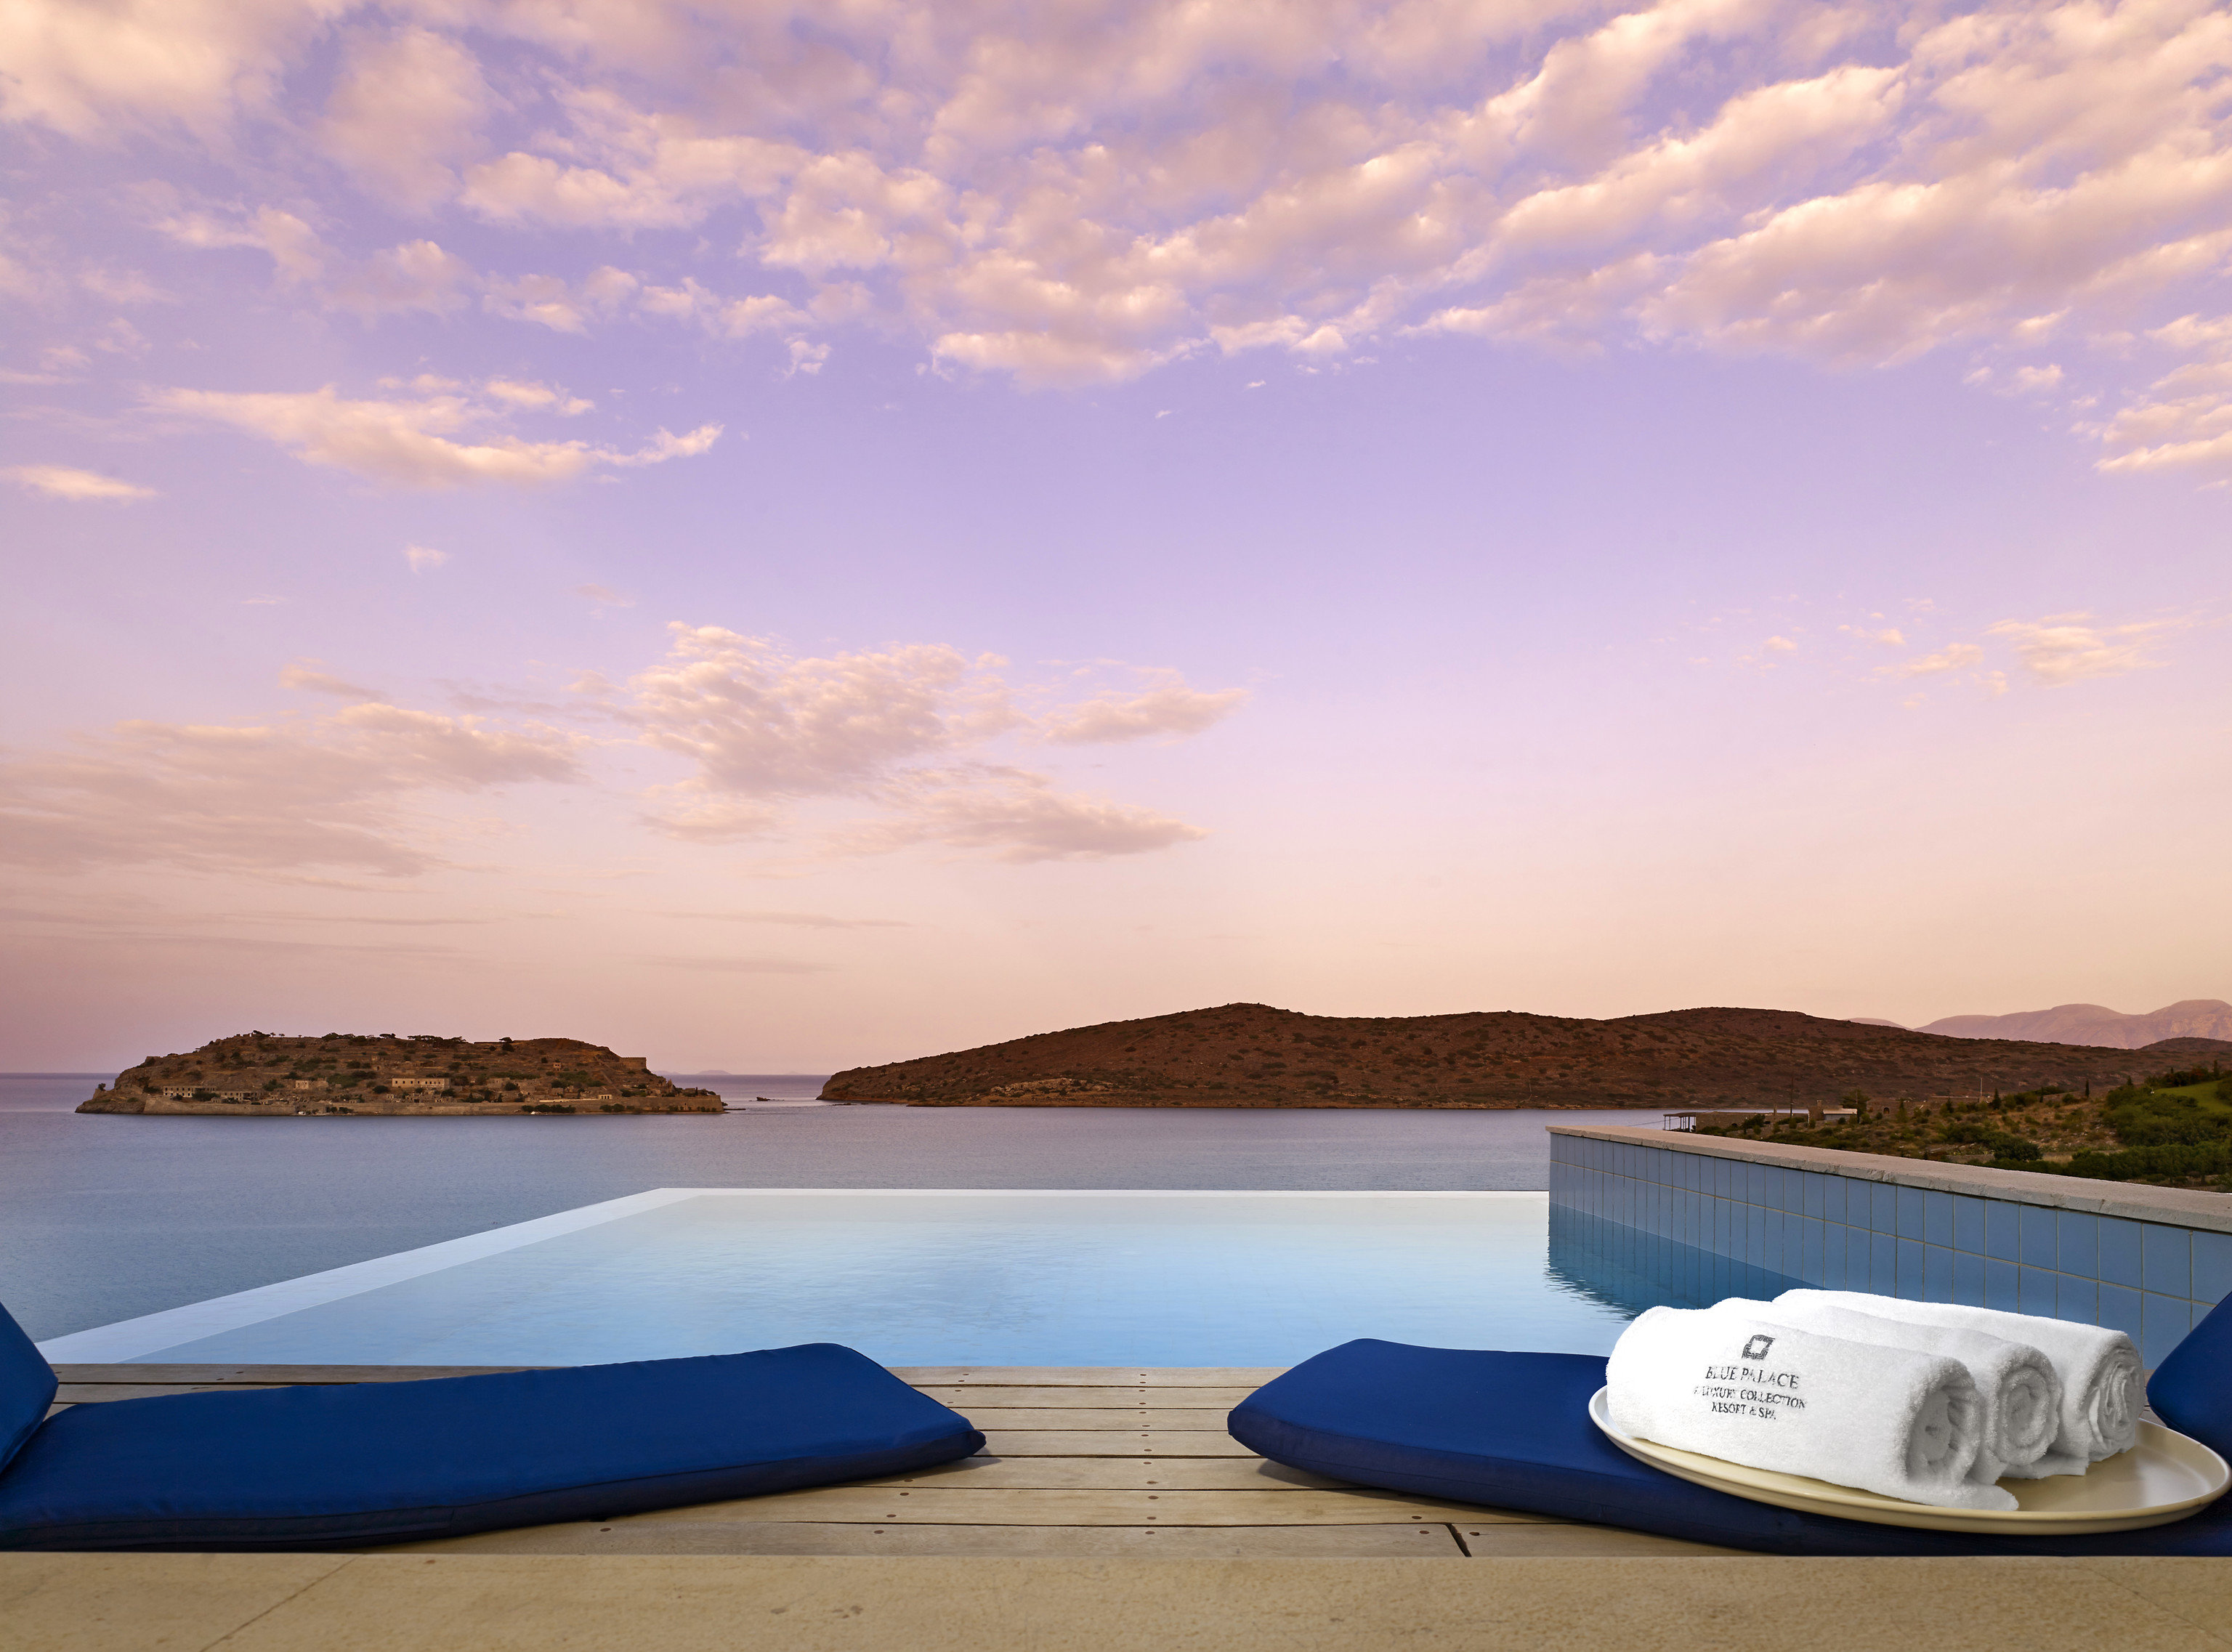 Hotels Romance sky water outdoor horizon Sea morning blue Ocean sandy day